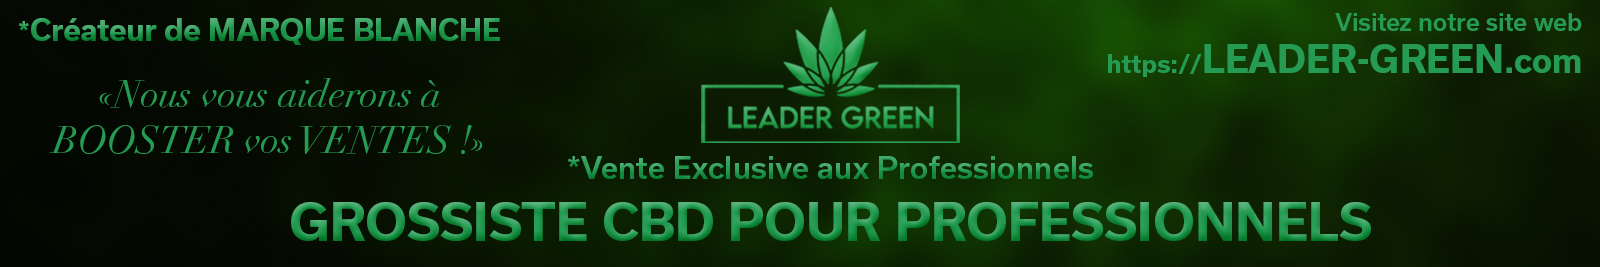 Lecannabiste Leadergreen 2021 Banner 2